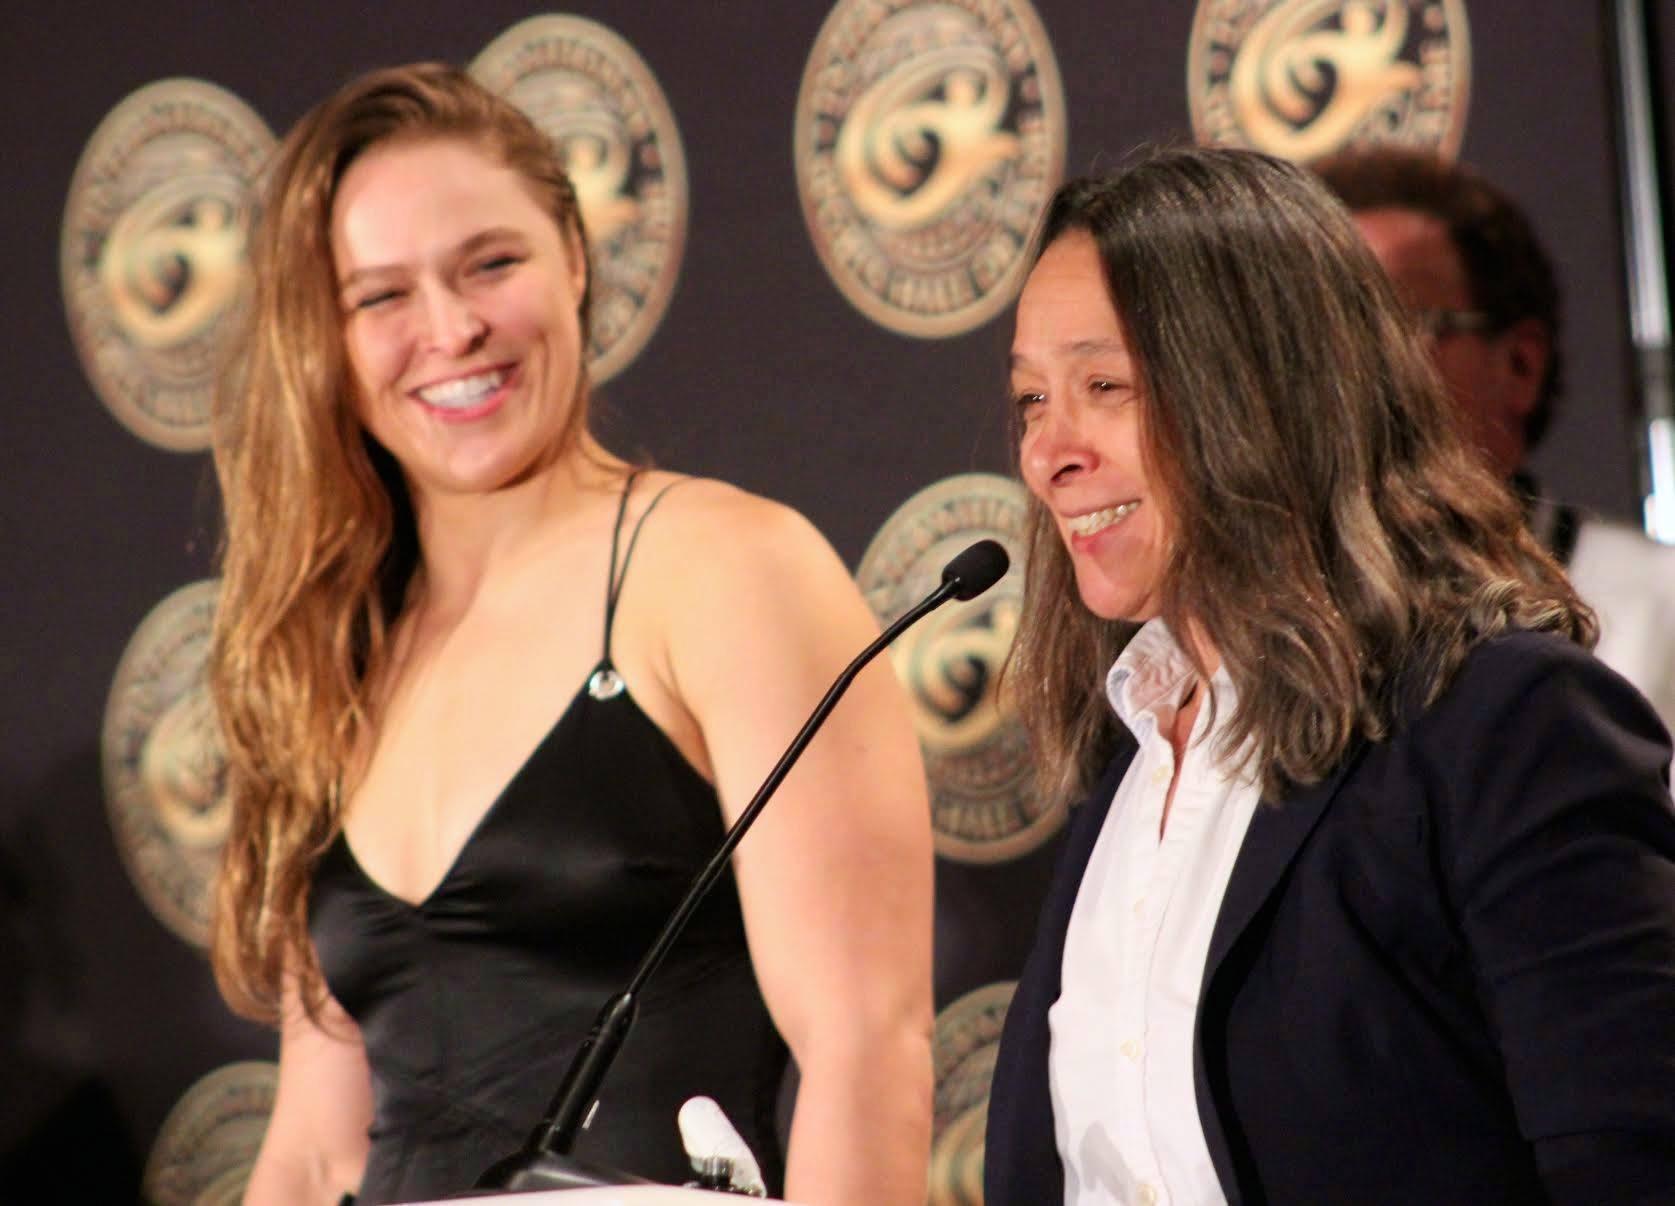 AnnMaria De Mars, Ronda Rousey's mom